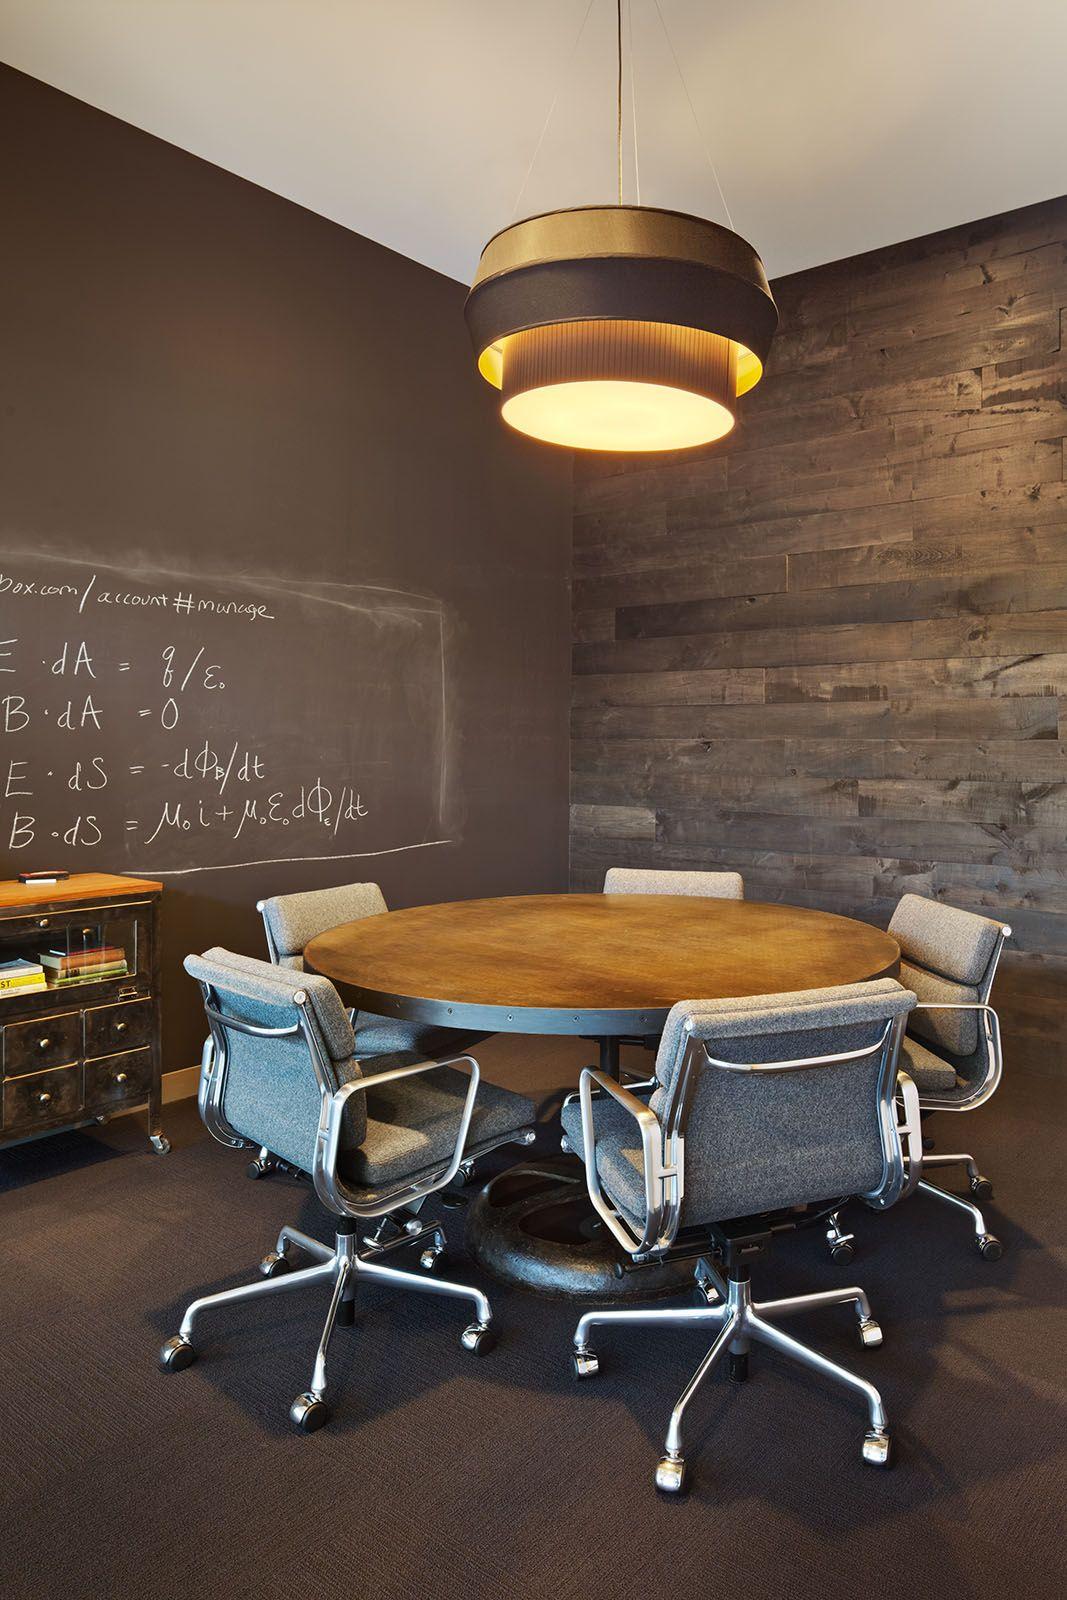 Dropbox Headquarters San Francisco | Büro ideen, Büros und Möbel